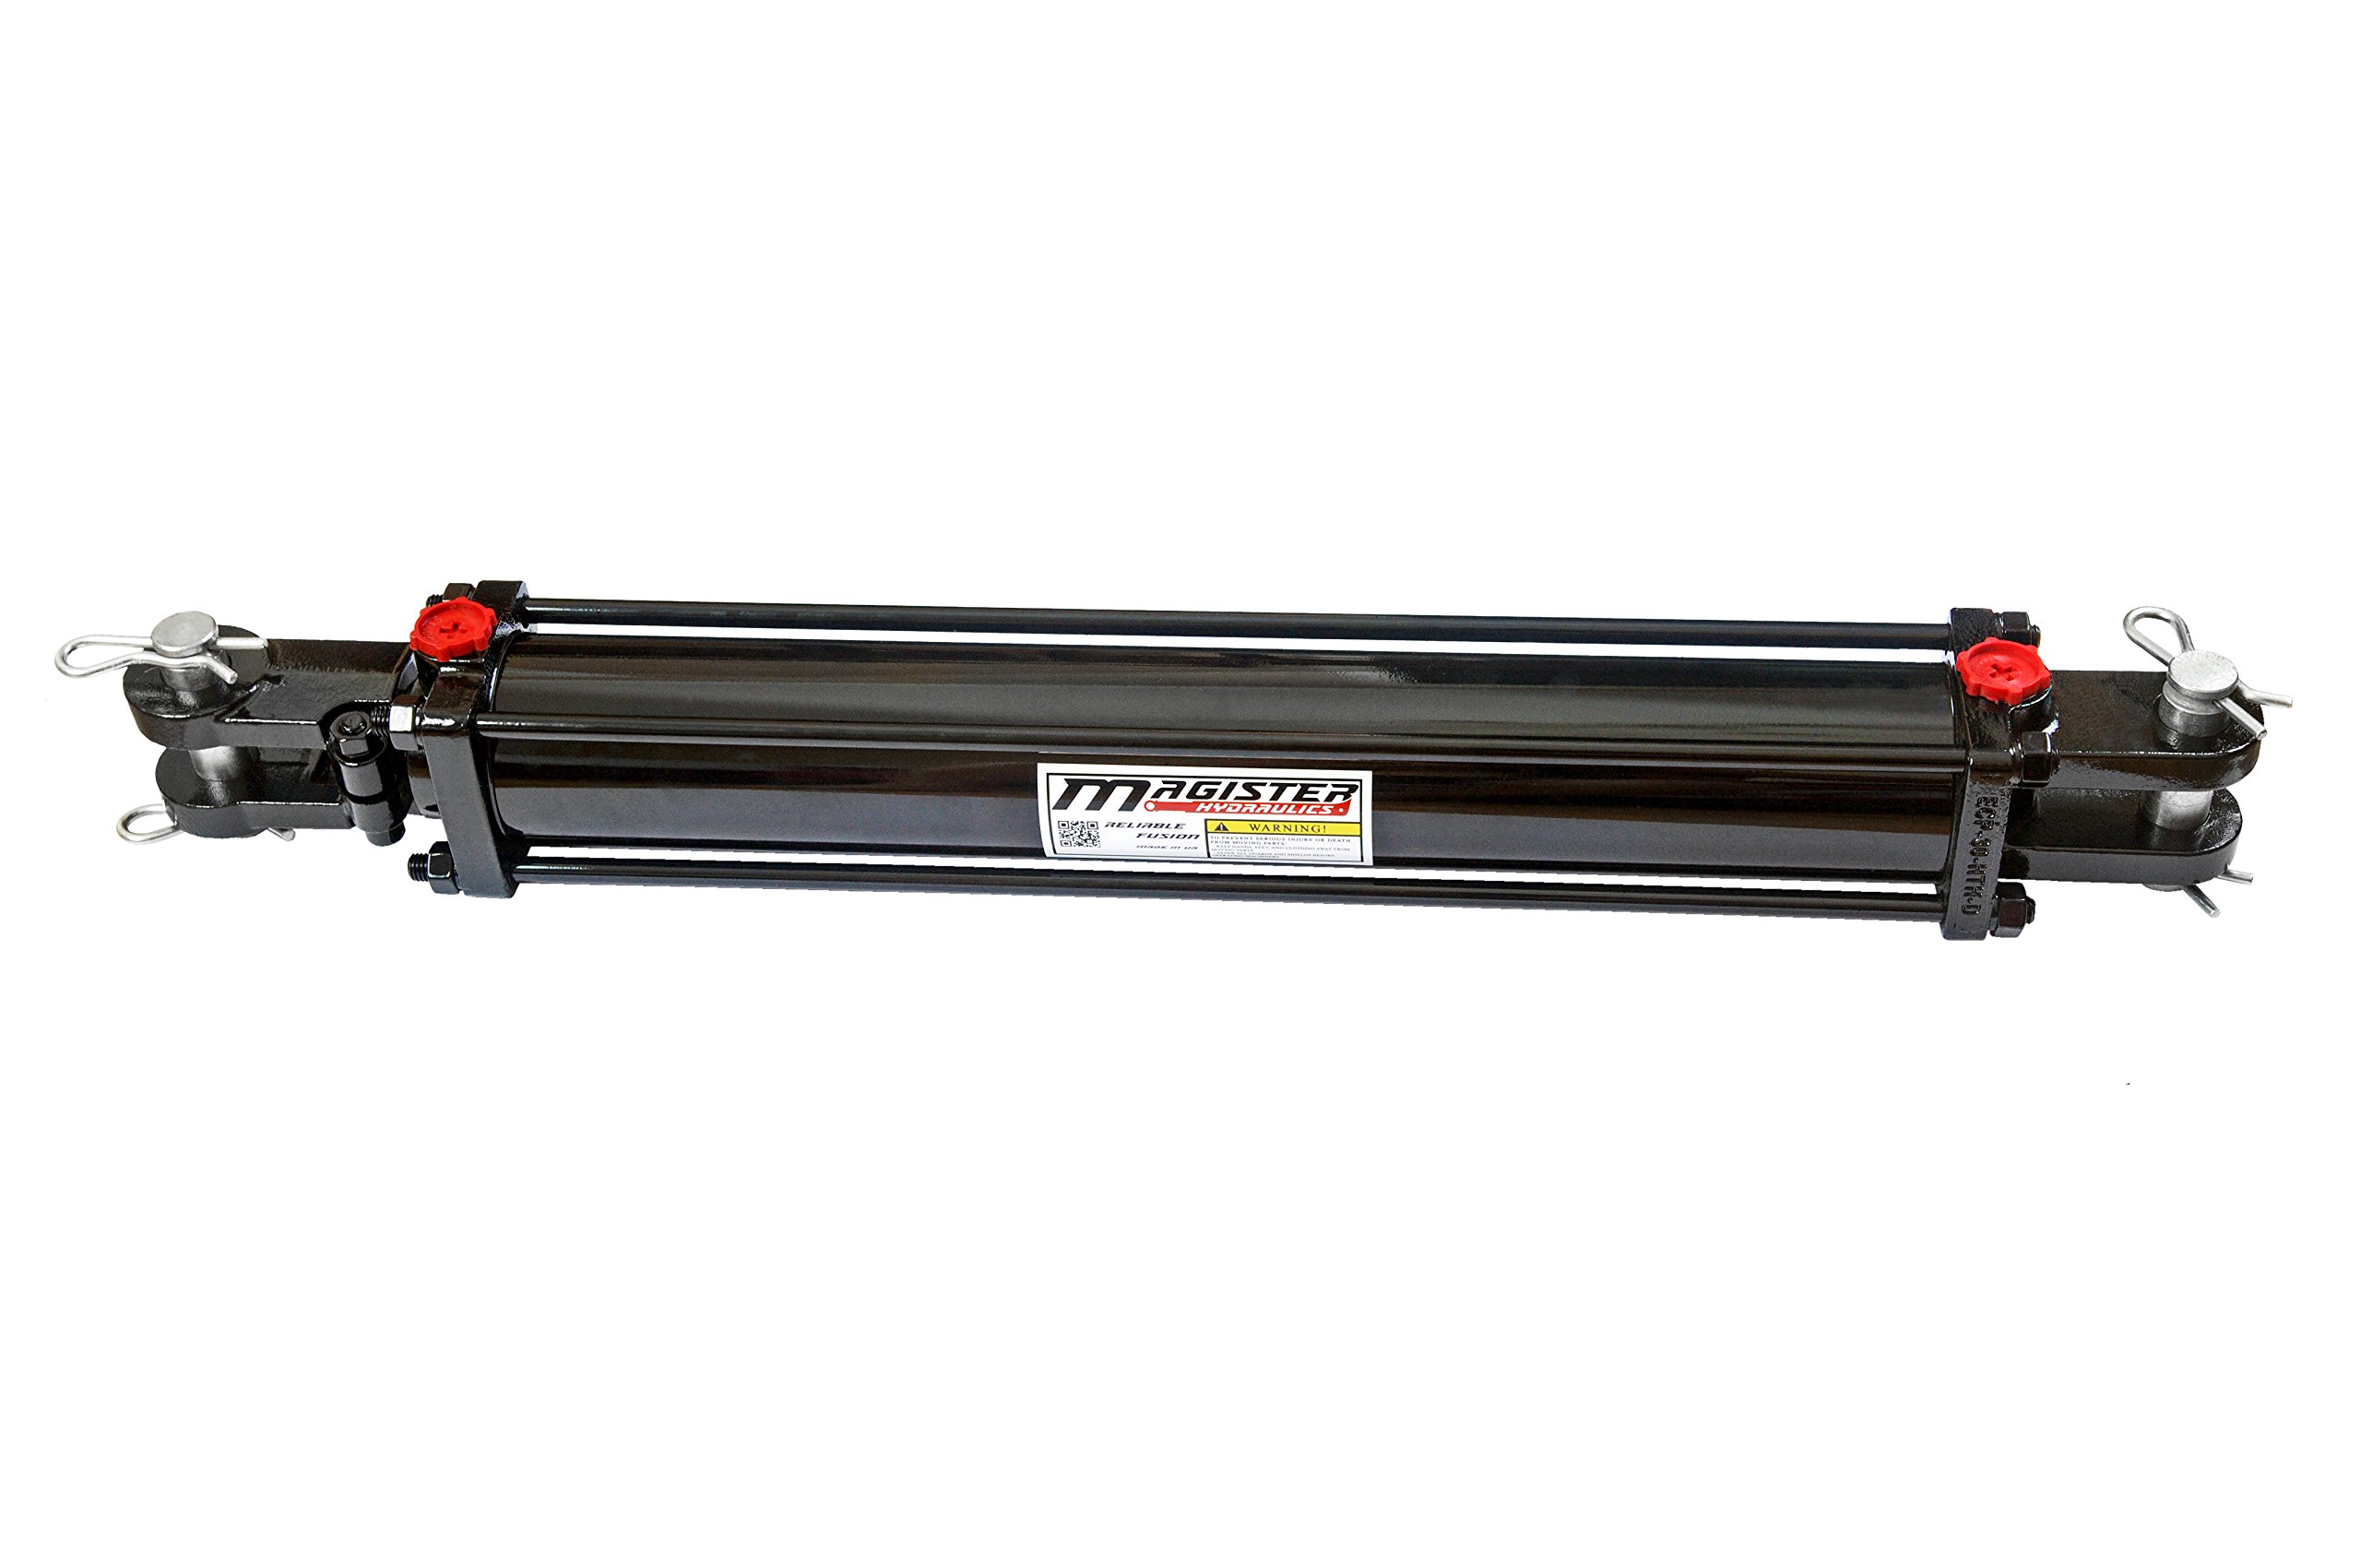 Double Acting Tie-rod Hydraulic Cylinder 3'' Bore 18'' Stroke Tie Rod